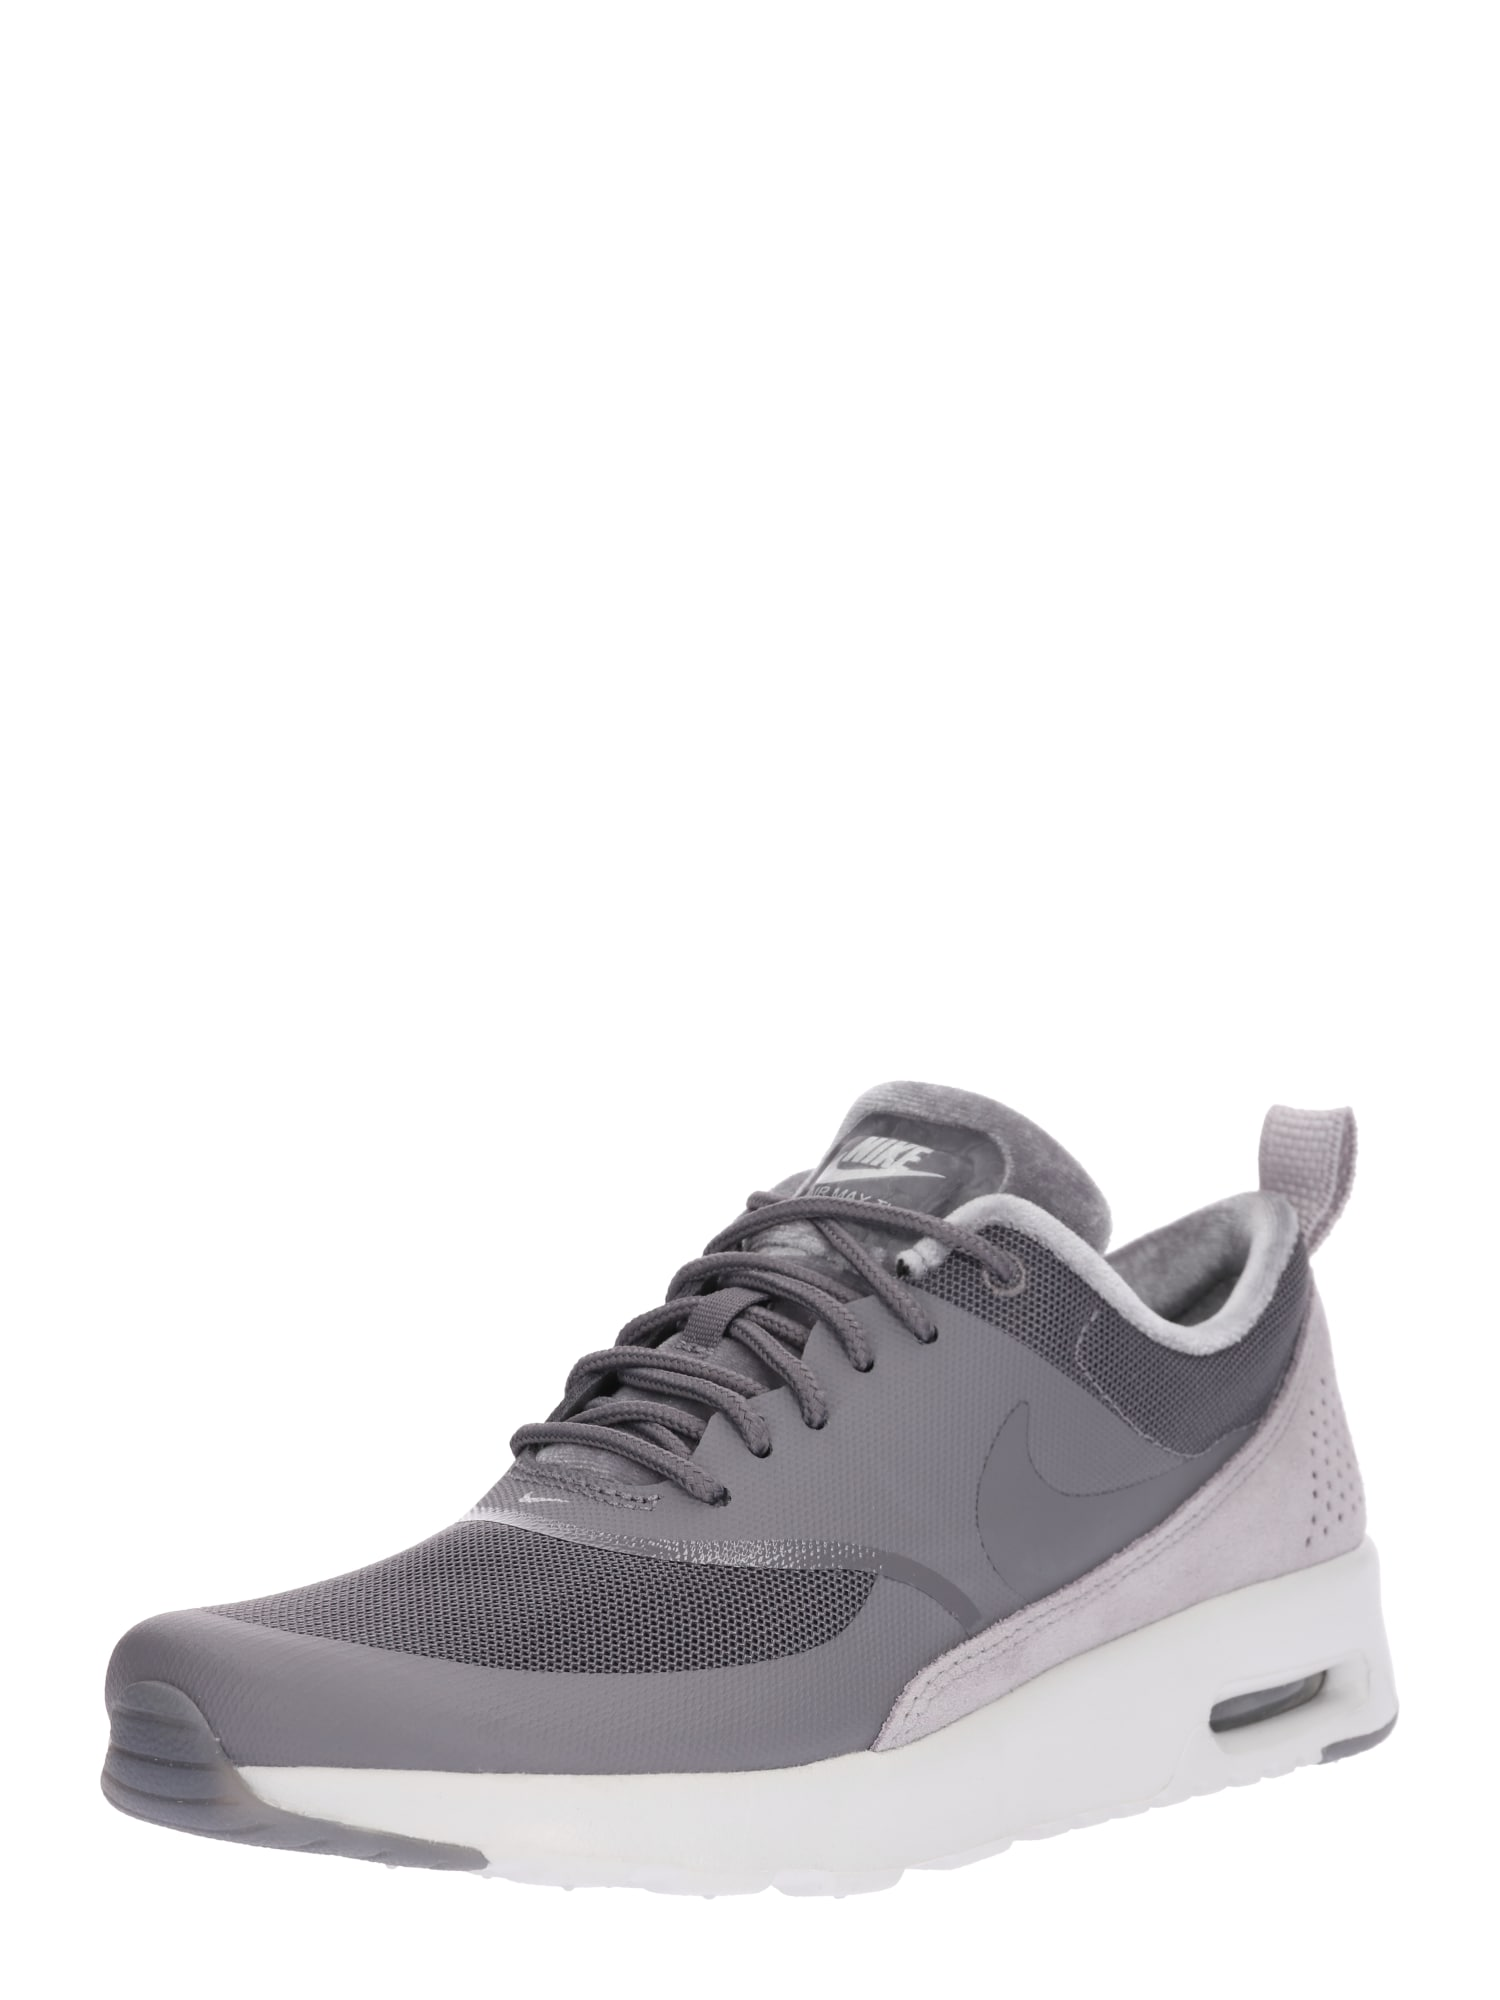 Nike Sportswear, Dames Sneakers laag 'Air Max Thea LX', grijs / lichtgrijs / donkergrijs